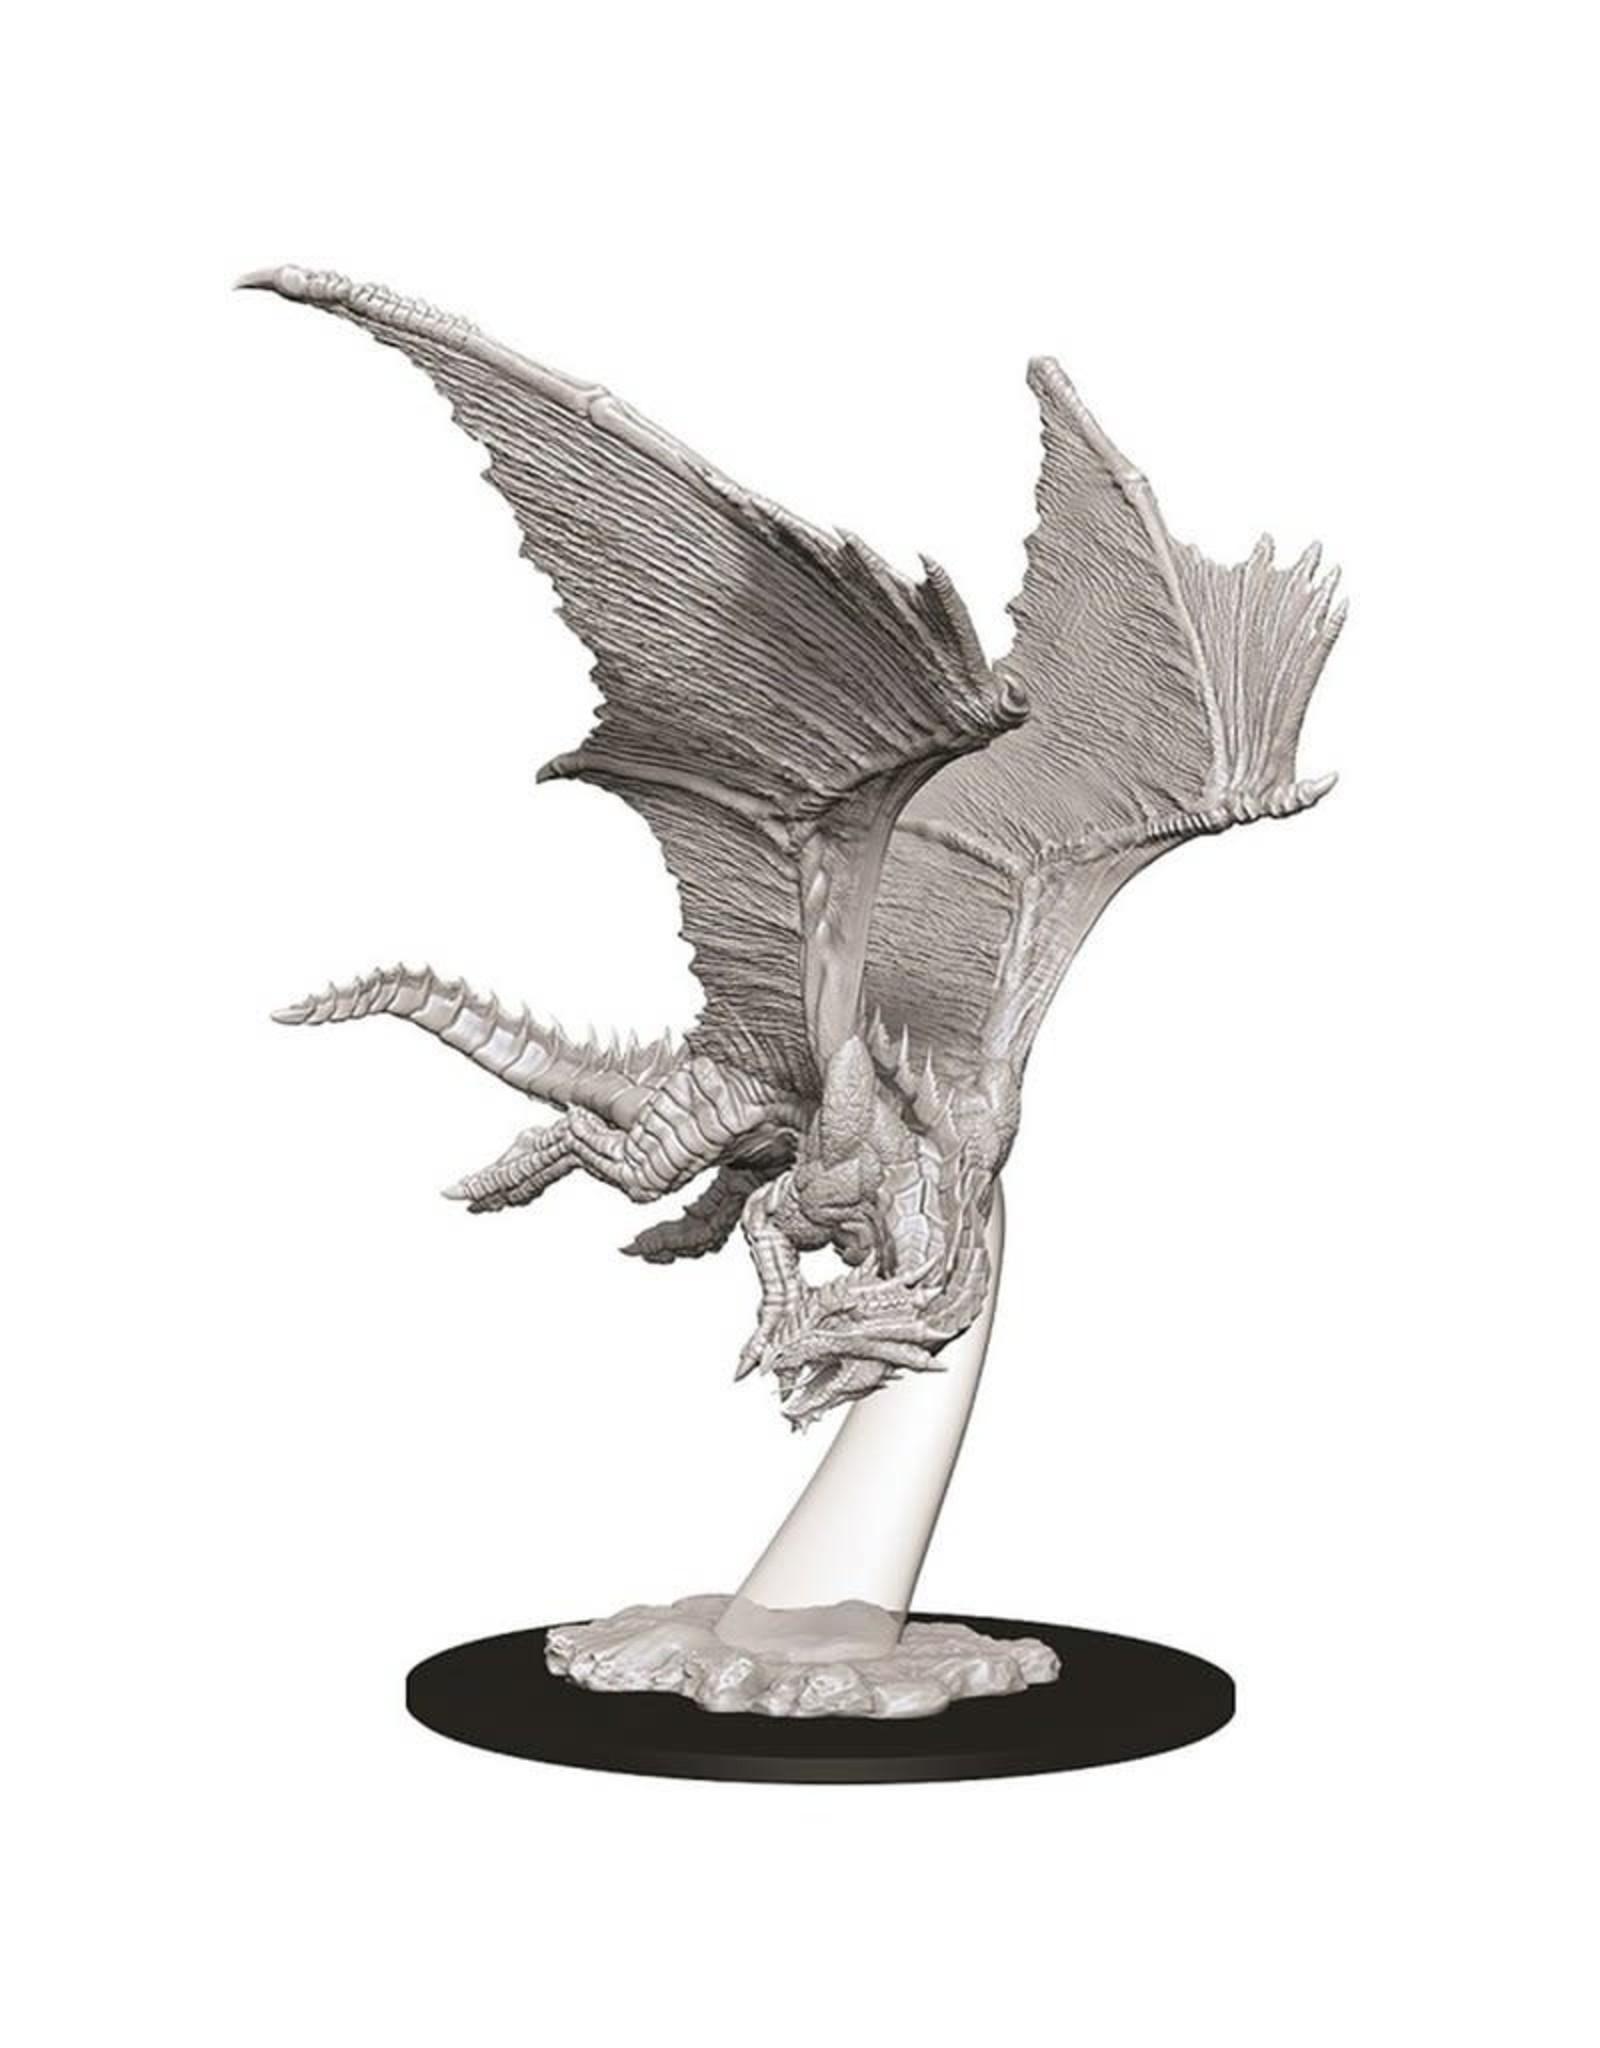 WizKids Dungeons & Dragons Nolzur's Marvelous Miniatures: Young Bronze Dragon